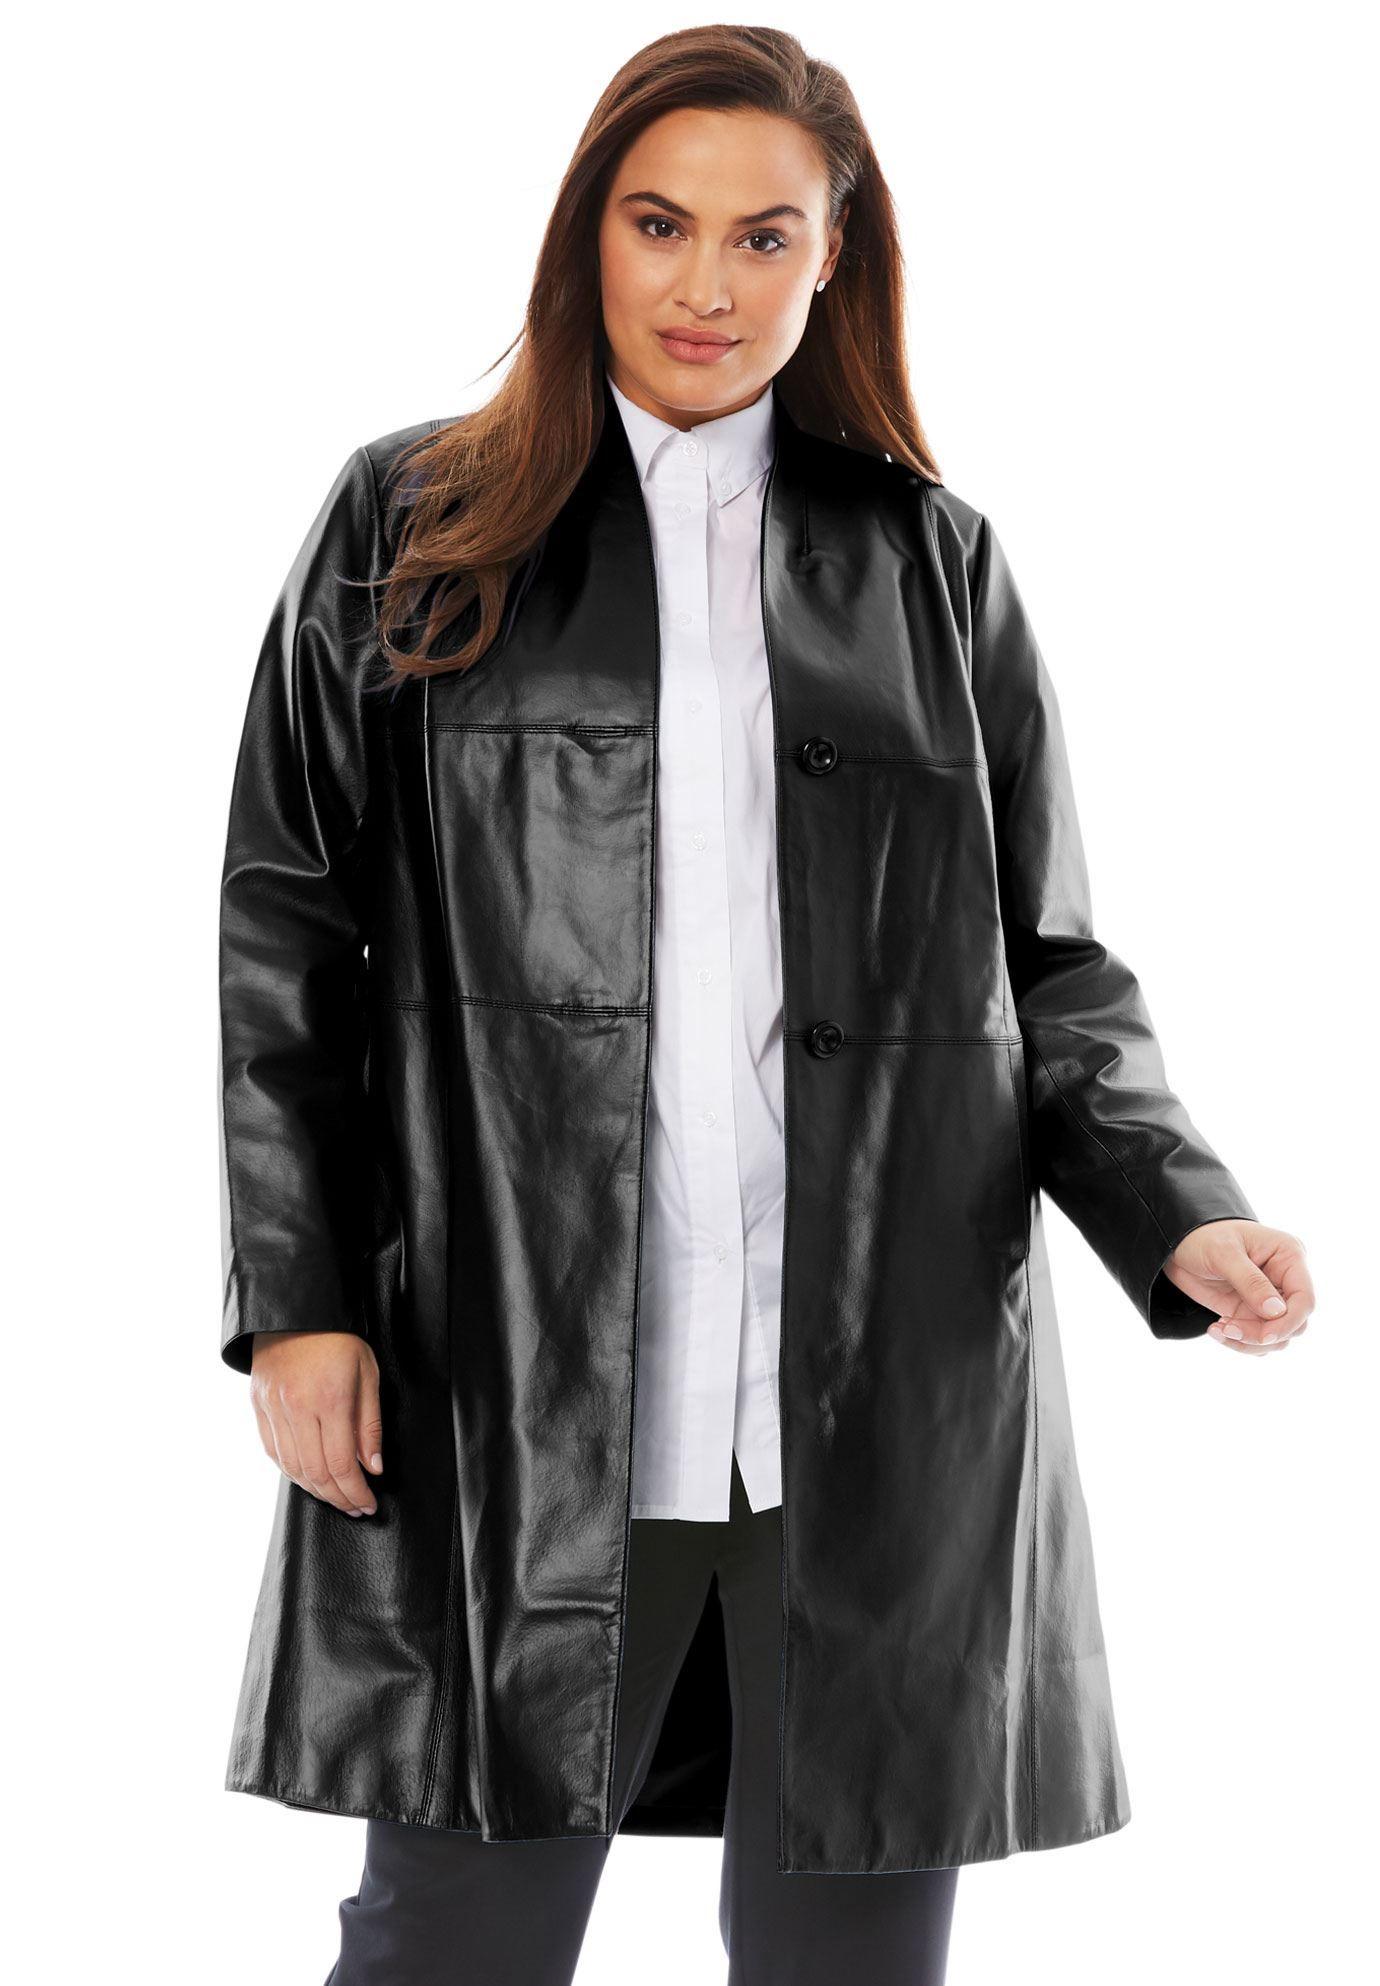 Leather Swing Coat Women's Plus Size Clothing Swing